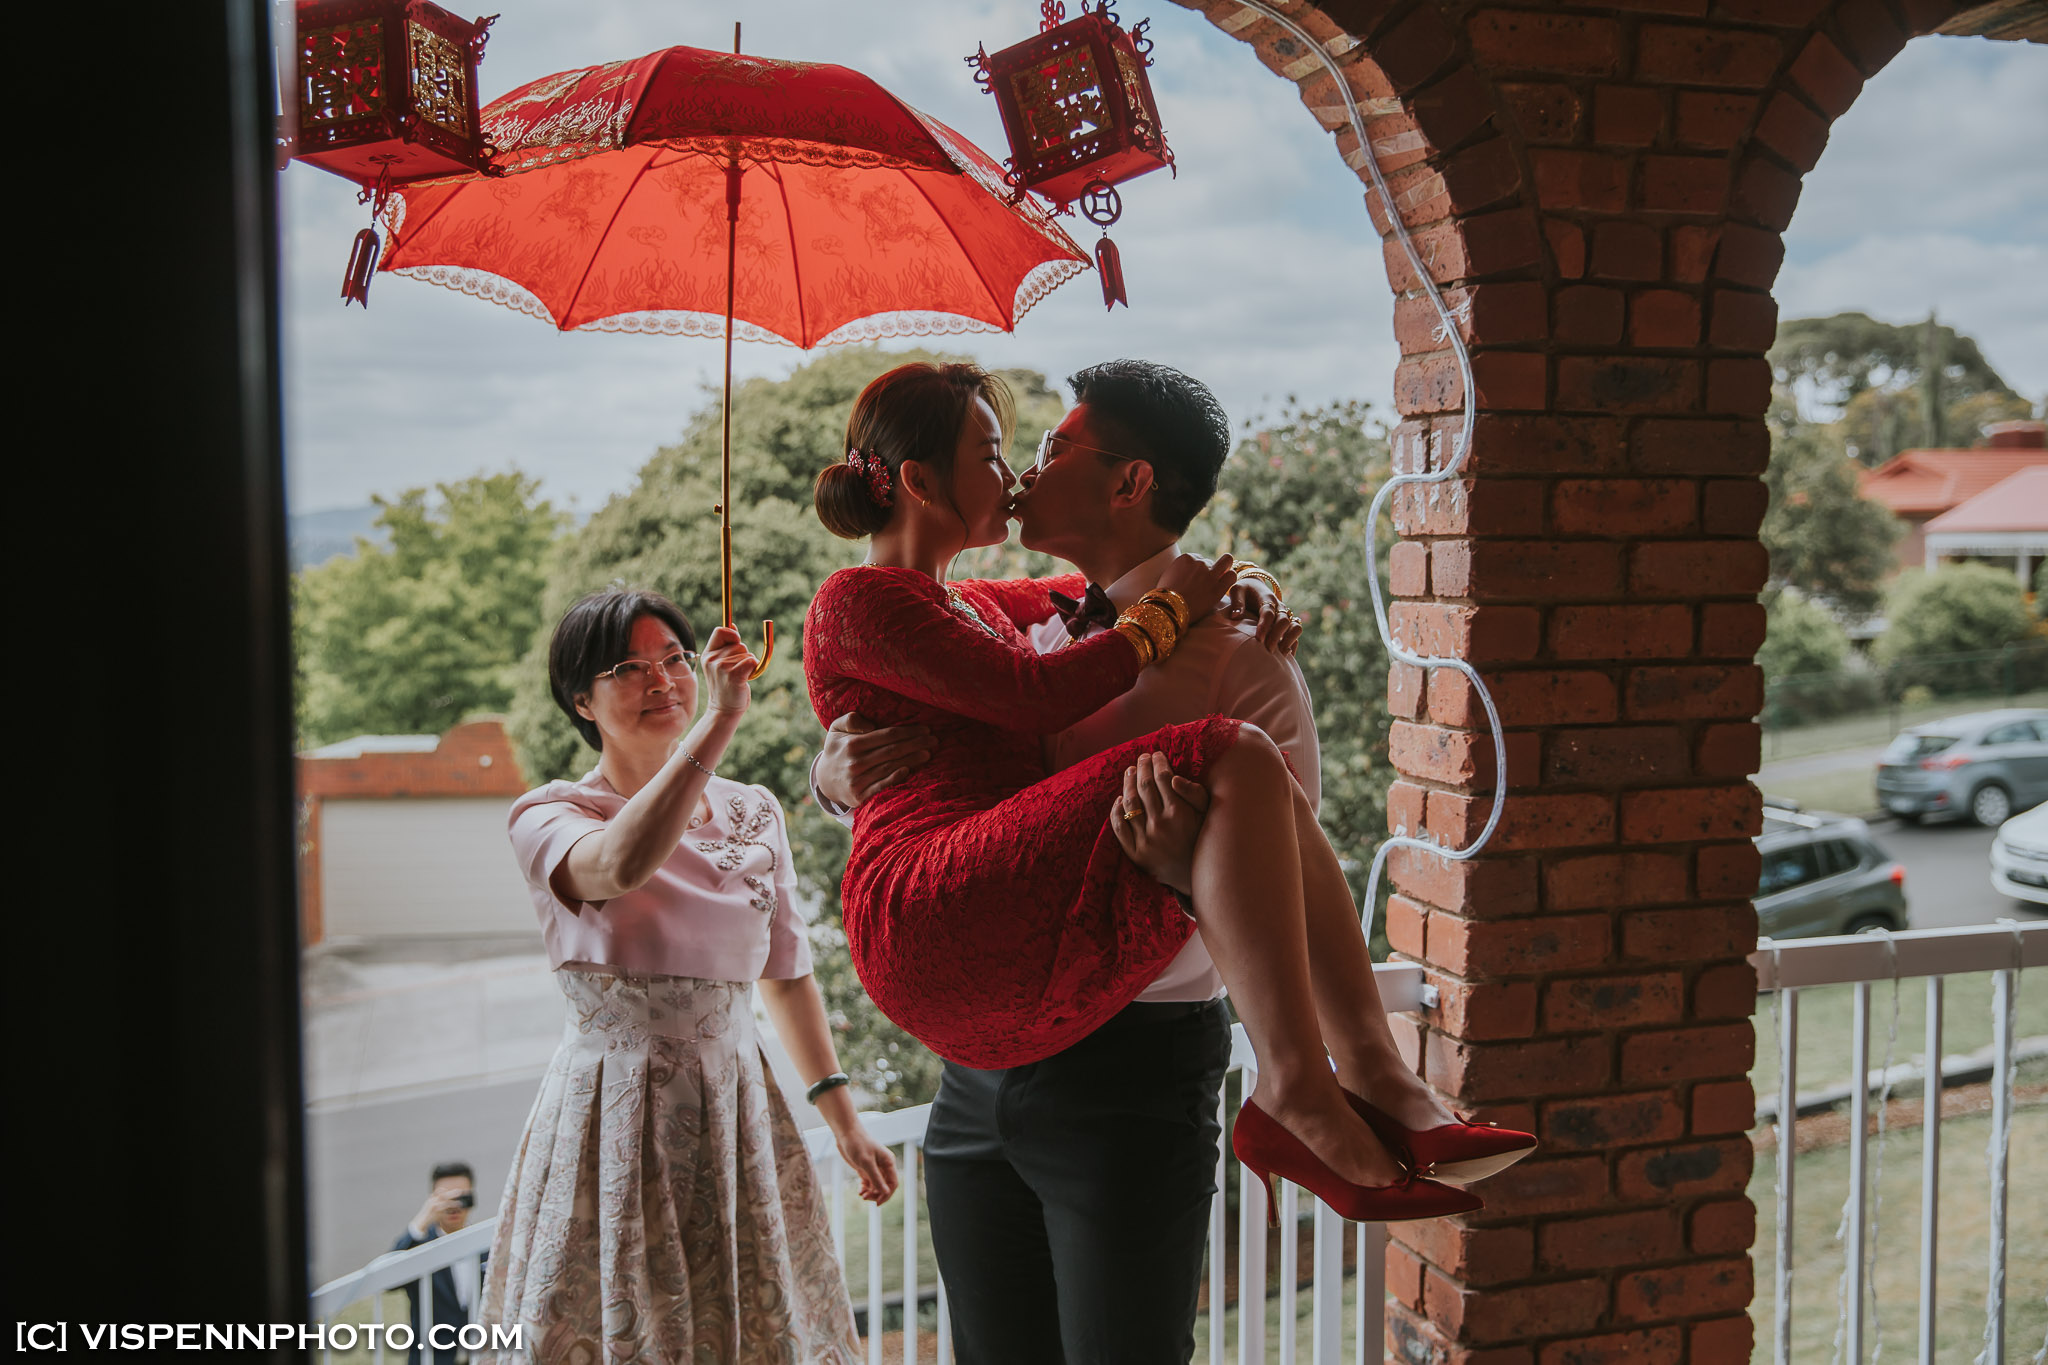 WEDDING DAY Photography Melbourne ElitaPB 02836 2P 1DX2 ZHPENN